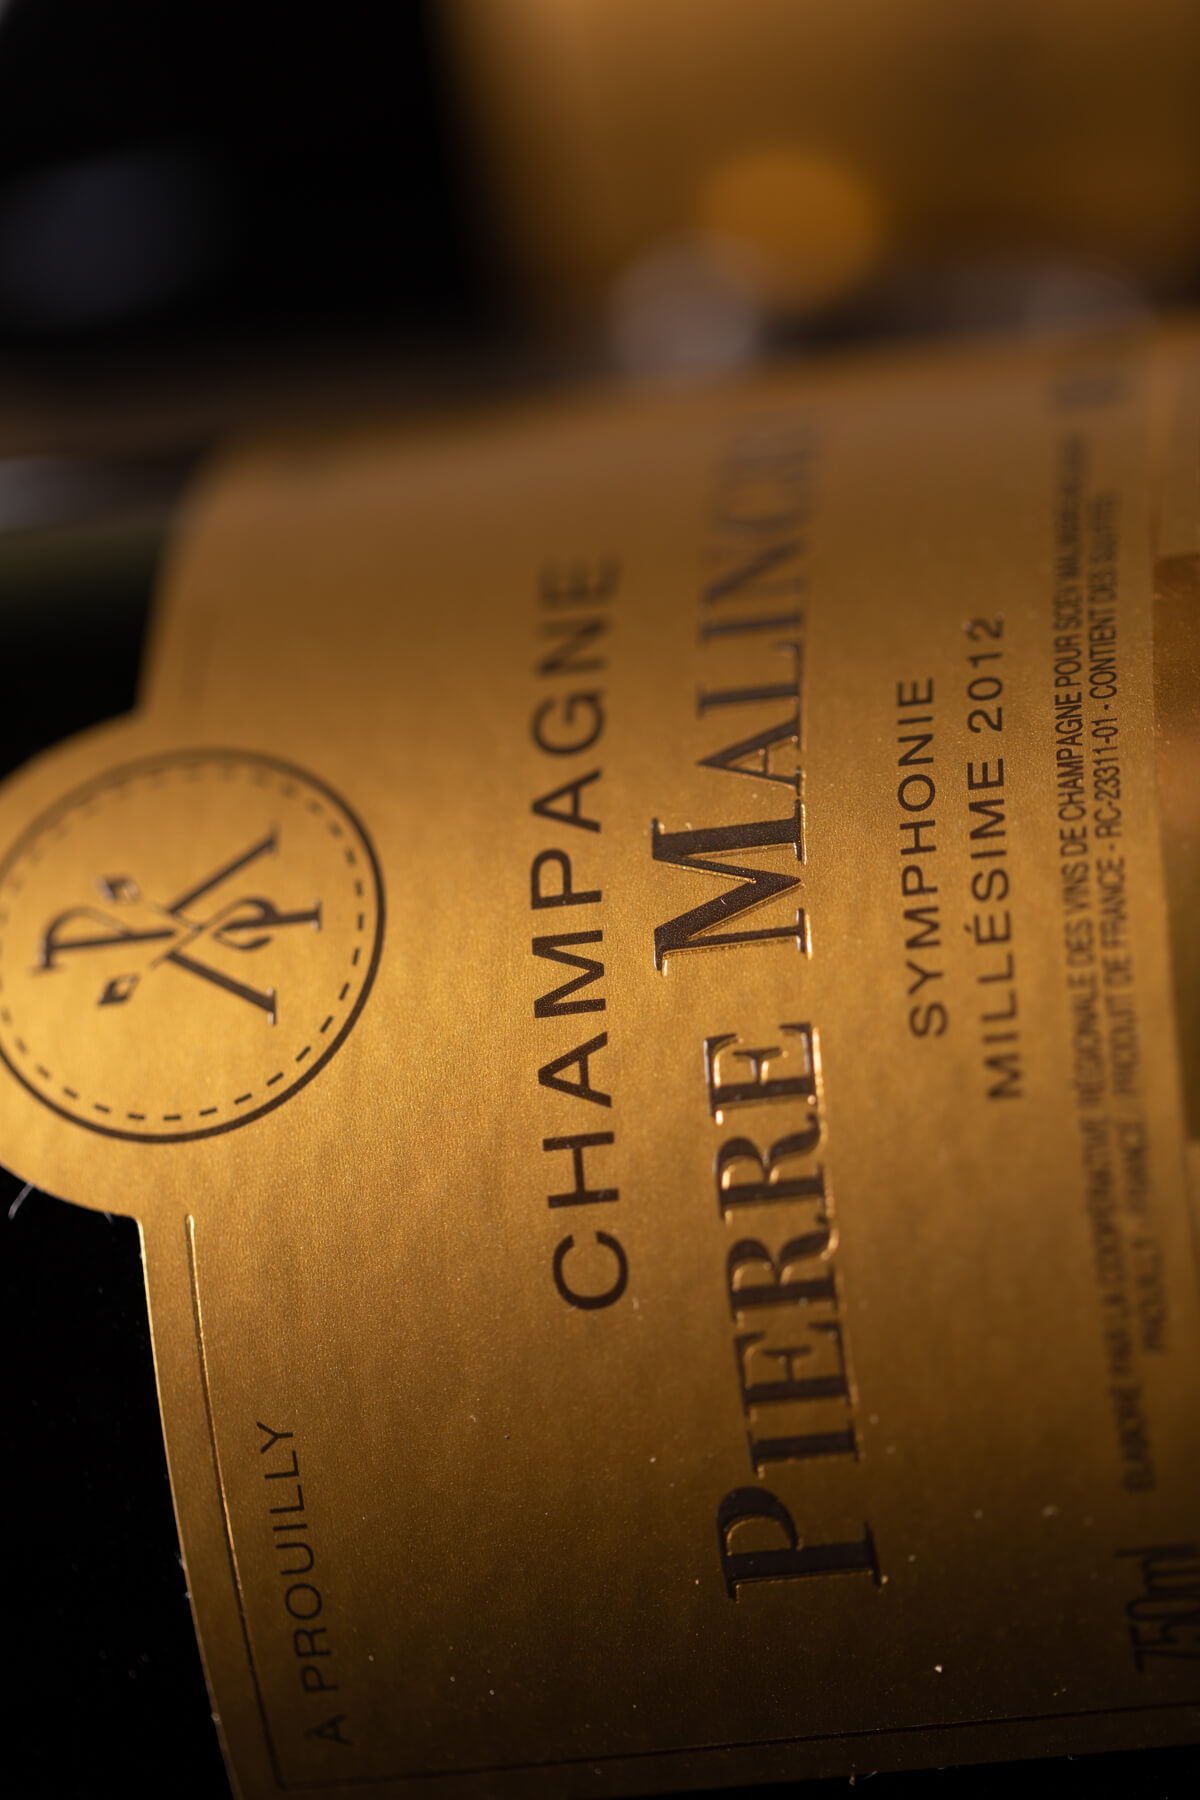 Photographe Champagne Epernay - Tristan Meunier - Champagne Malingre -3.jpg